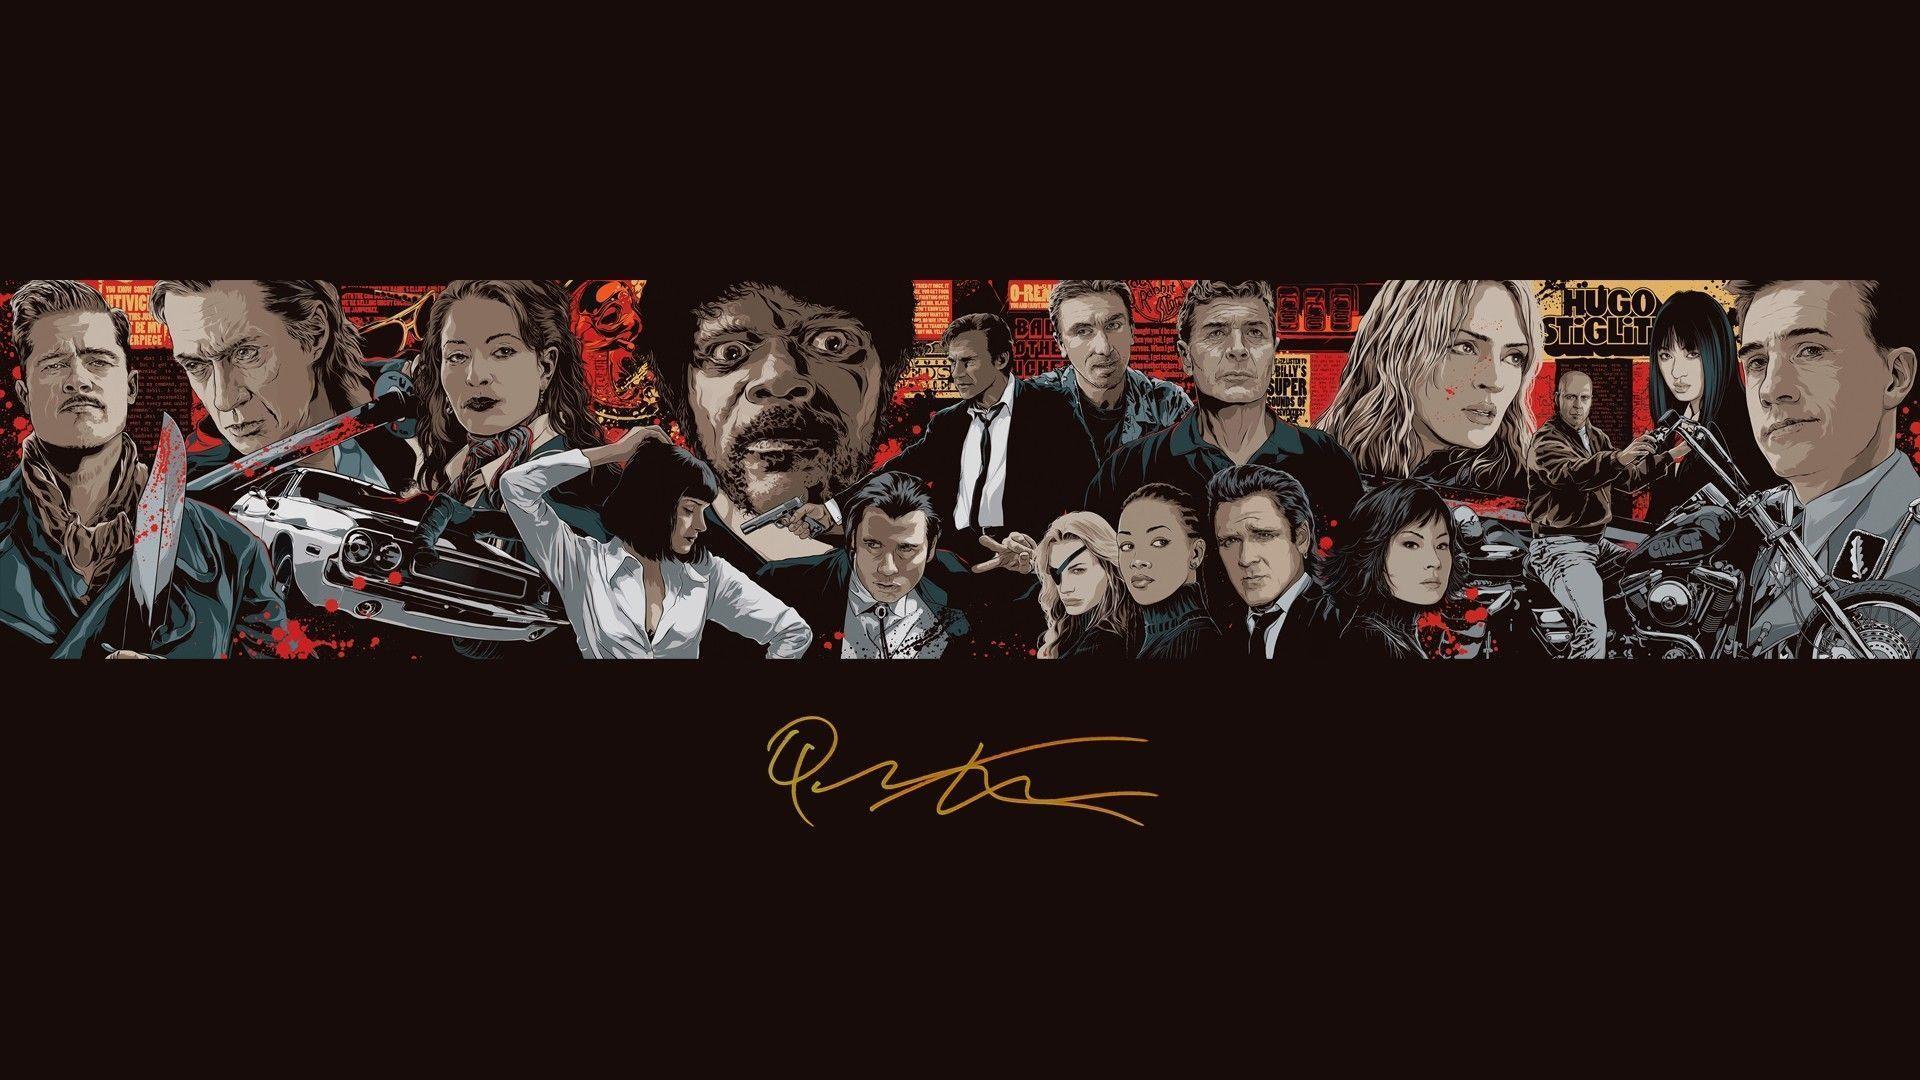 Quentin Tarantino Wallpapers Top Free Quentin Tarantino